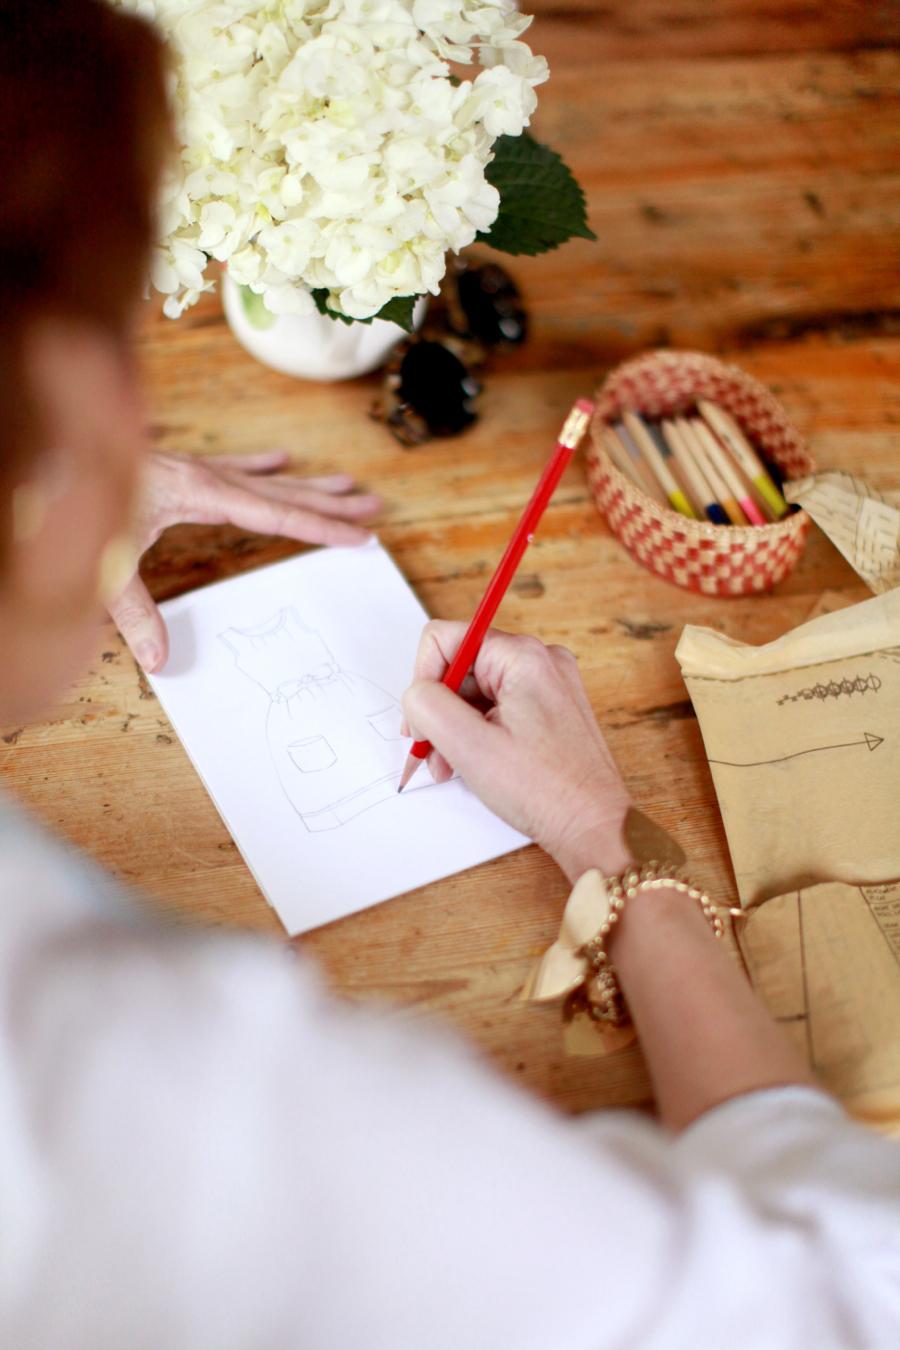 Kayce-hughes-home-nashville-fashion-designer-matchbook-magazine-20